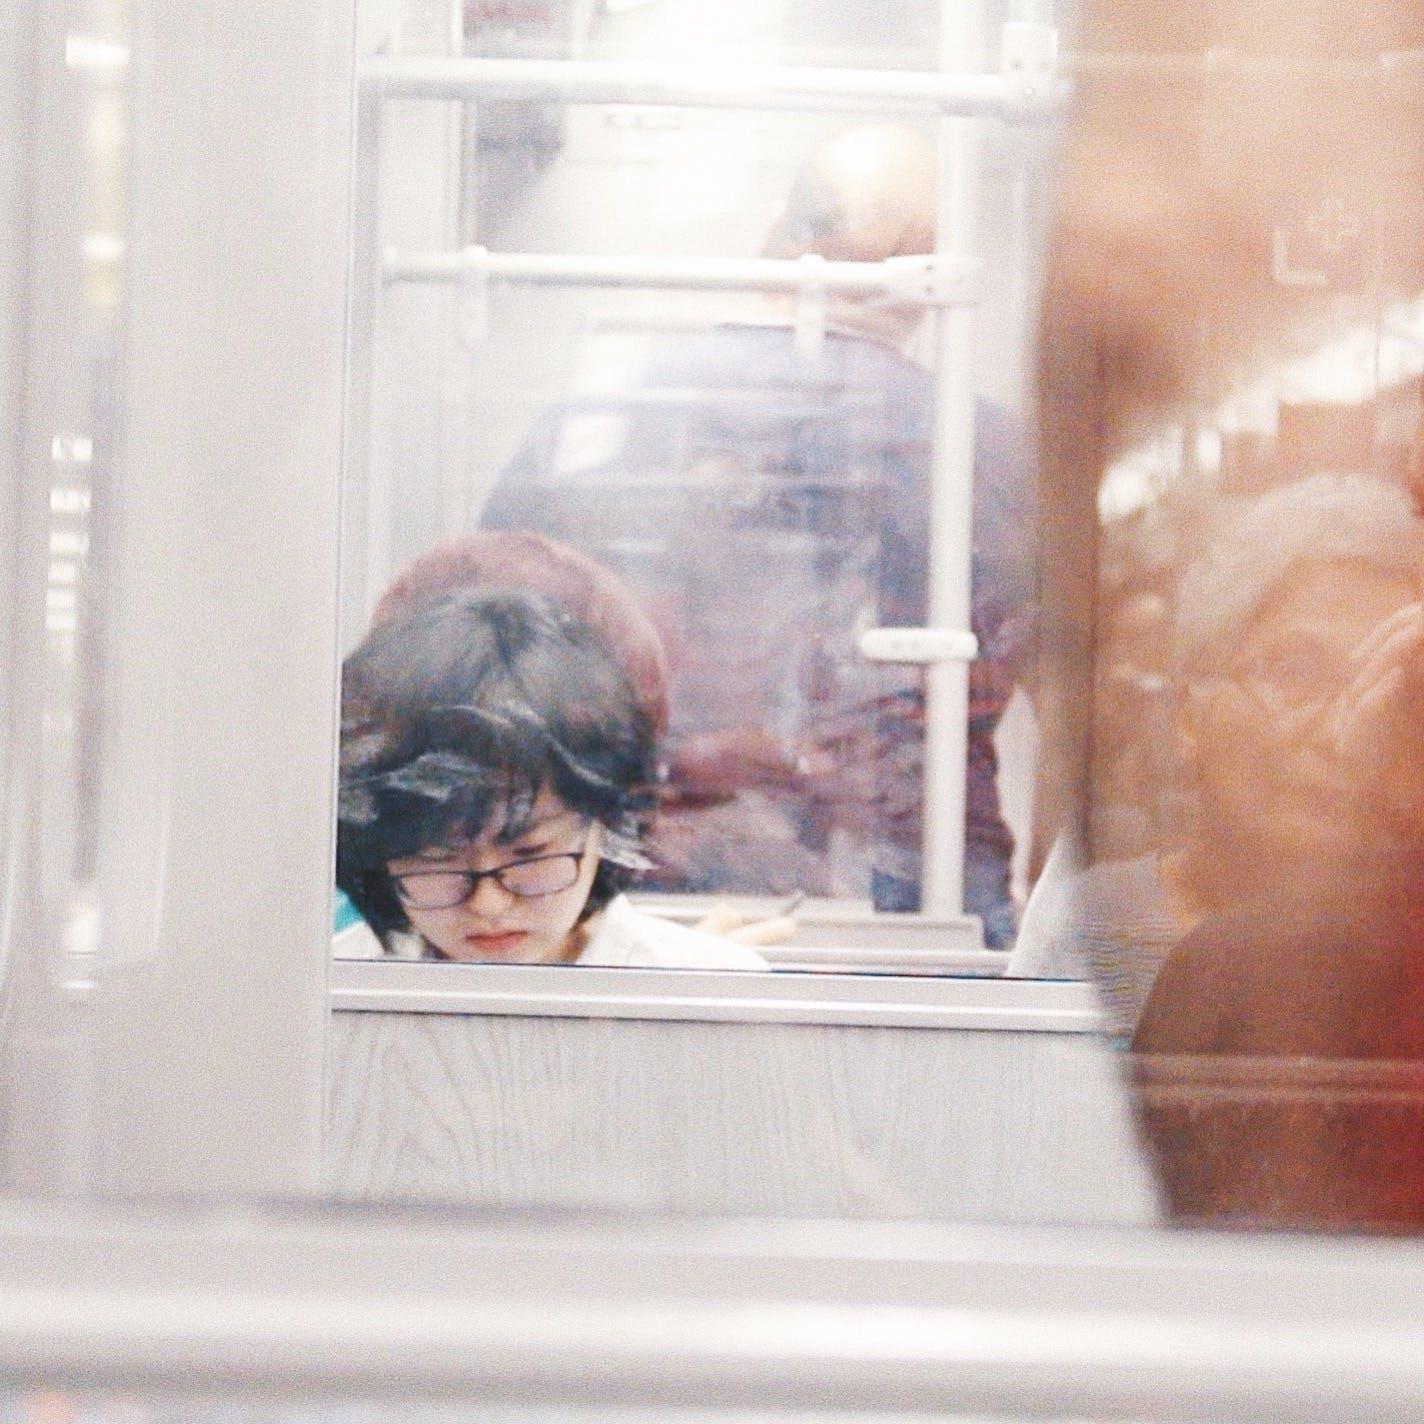 Woman Wearing Eyeglasses Reflection on Mirror